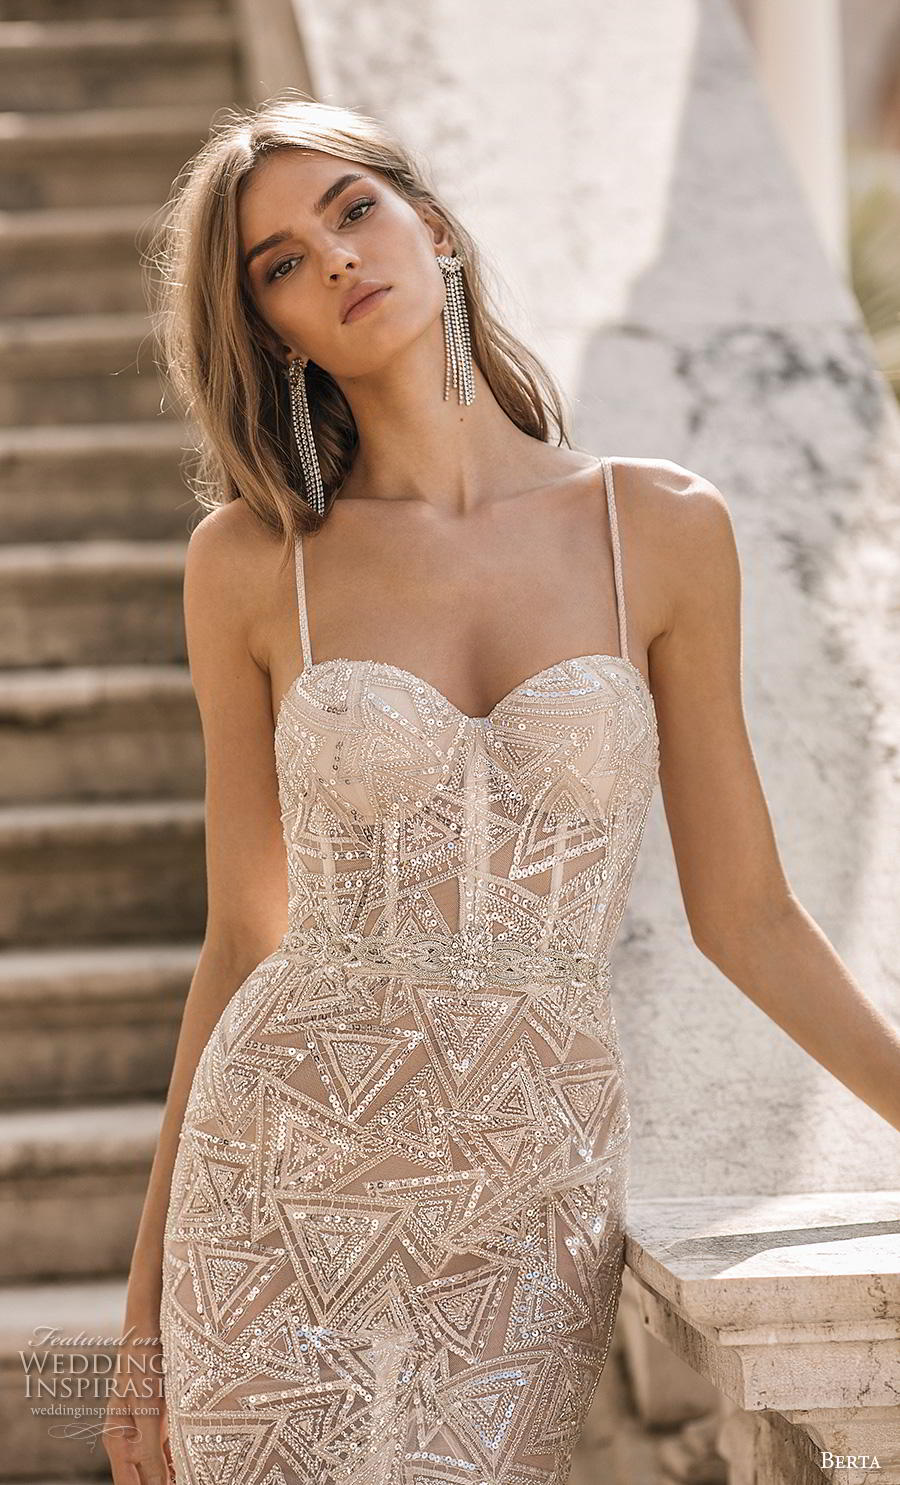 berta 2019 privee bridal thin strap sweetheart neckline full embellishment bustier glitzy glamorous elegant sheath wedding dress backless chapel train (8) zv